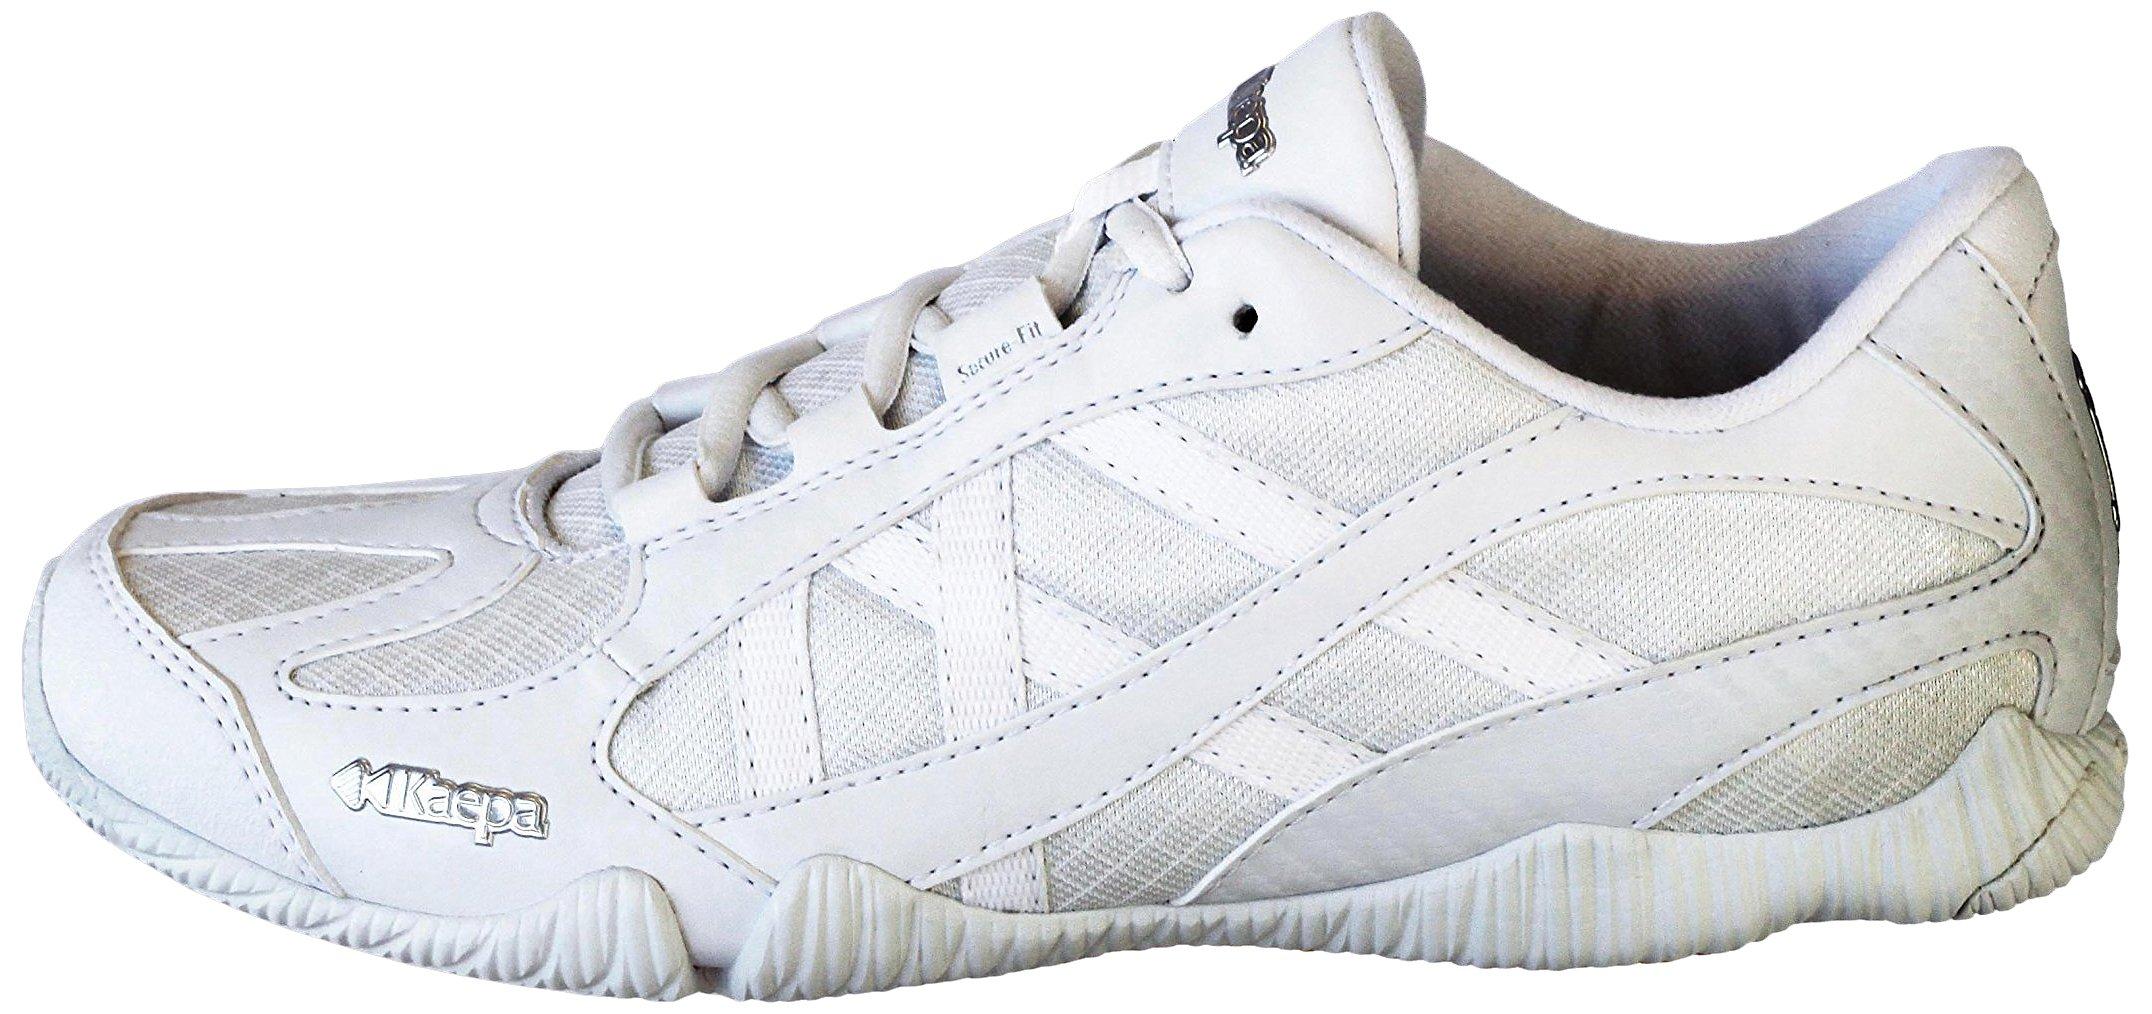 1d412c3246bb4b Amazon.com  Kaepa Youth Stellarlyte Cheer Shoe (Pair)  Sports   Outdoors